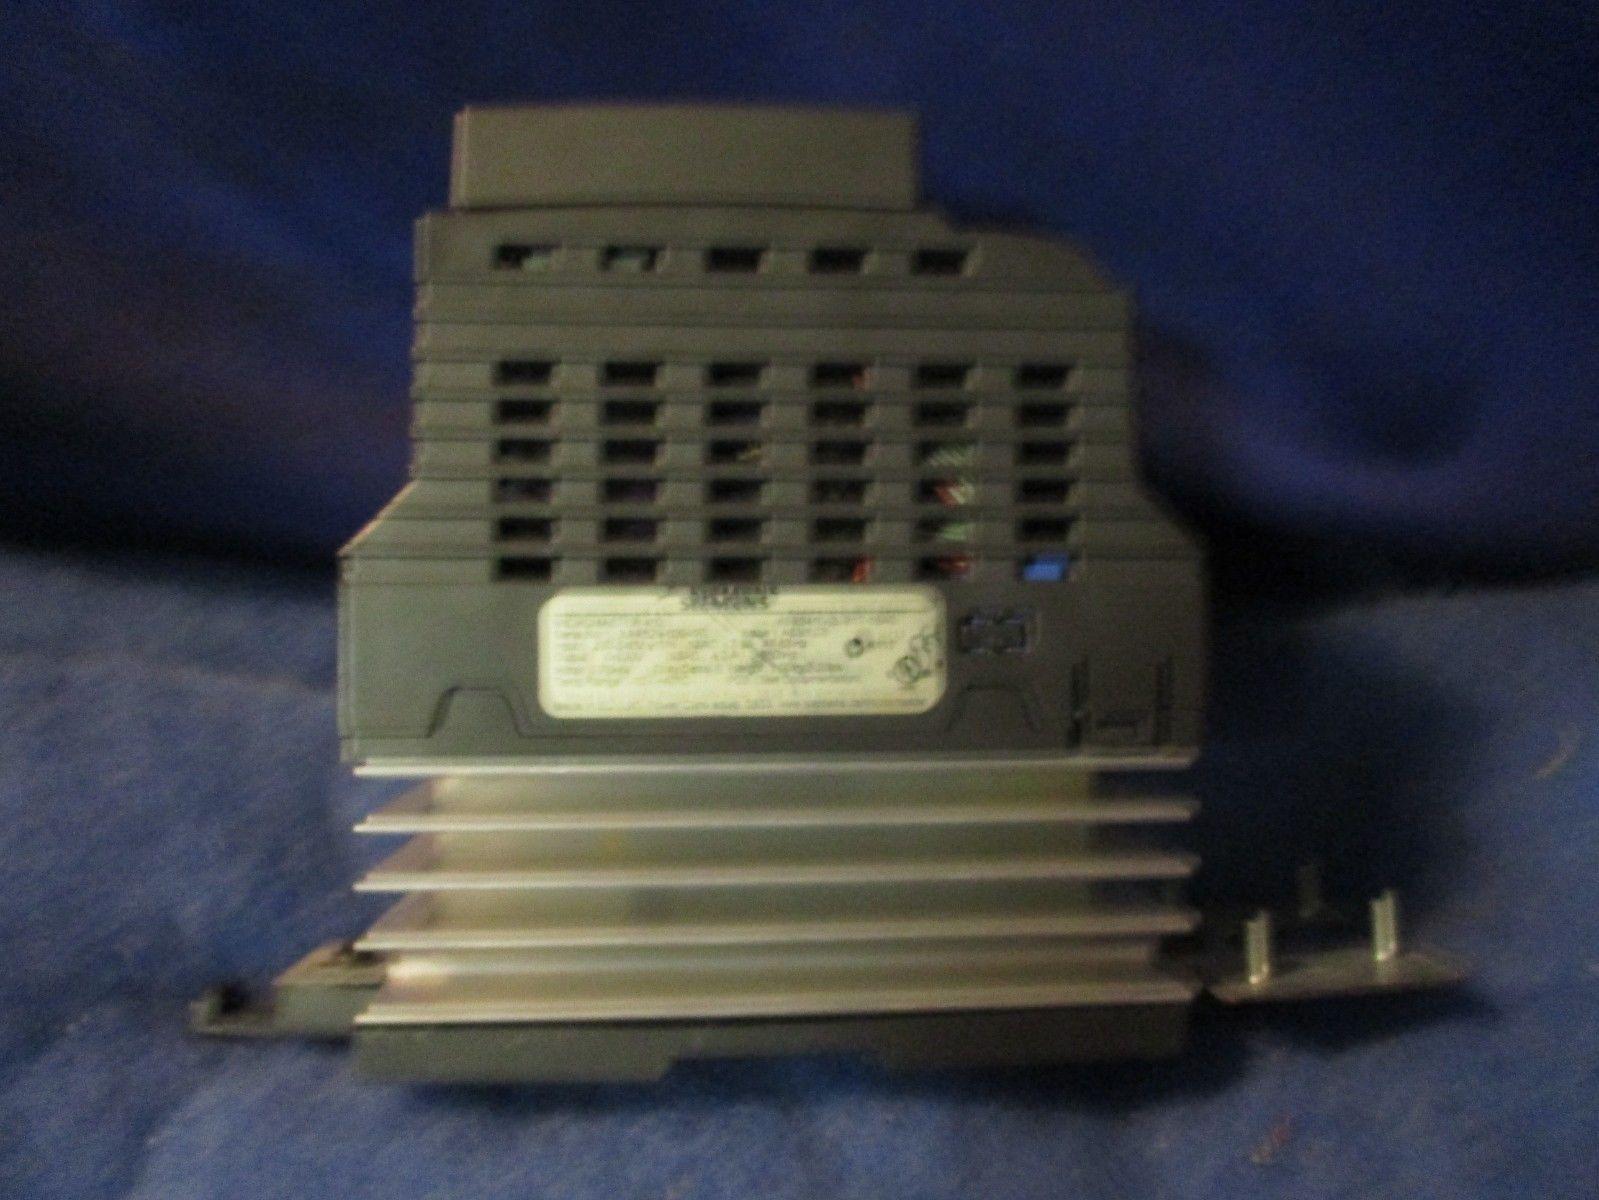 Siemens inverter 6SE6410-2UB17-5BA0 VFD drive  75kw 1 year warranty